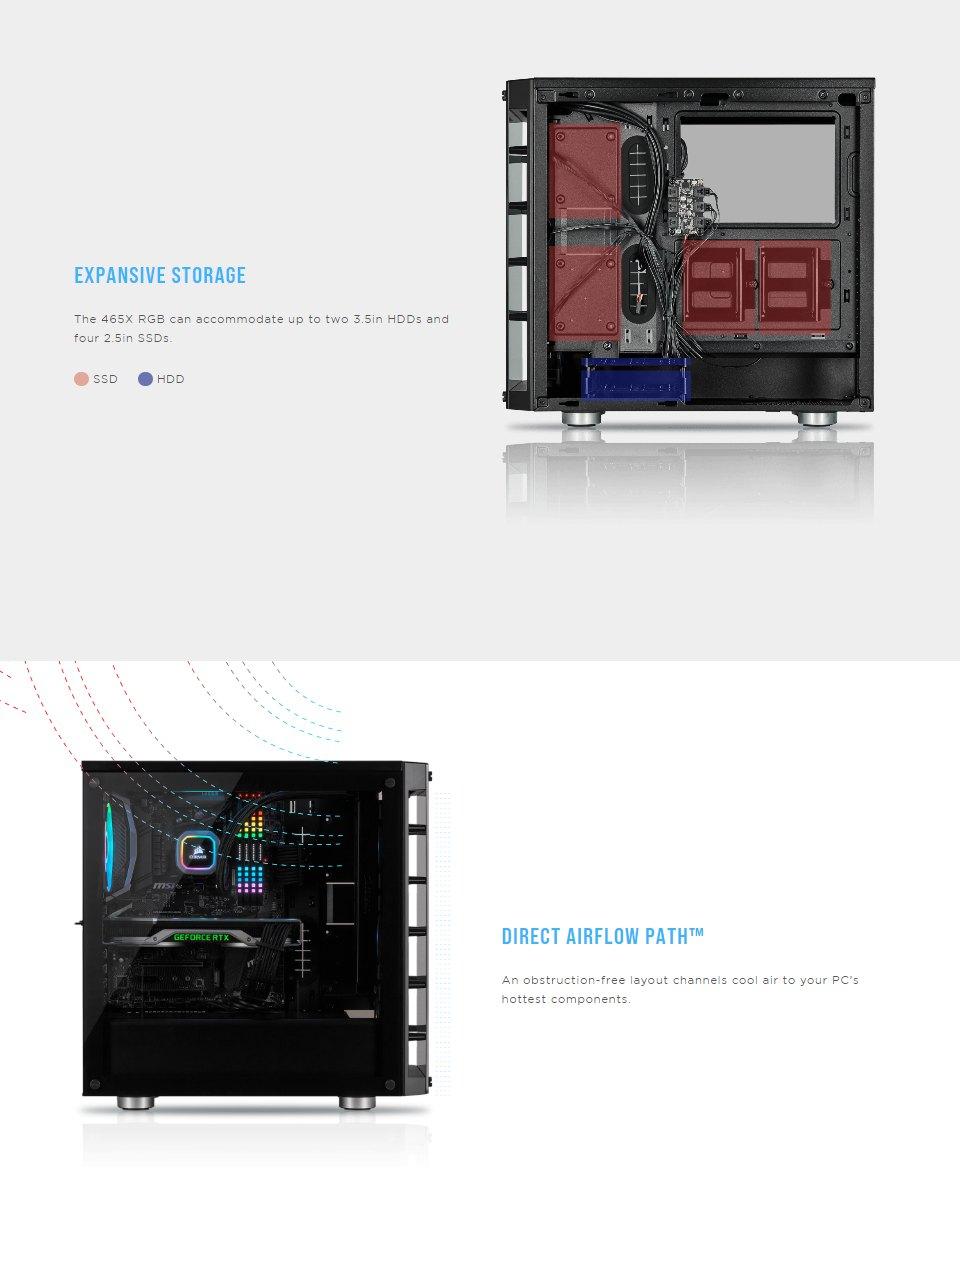 Corsair iCUE 465X RGB Tempered Glass Case Black features 3